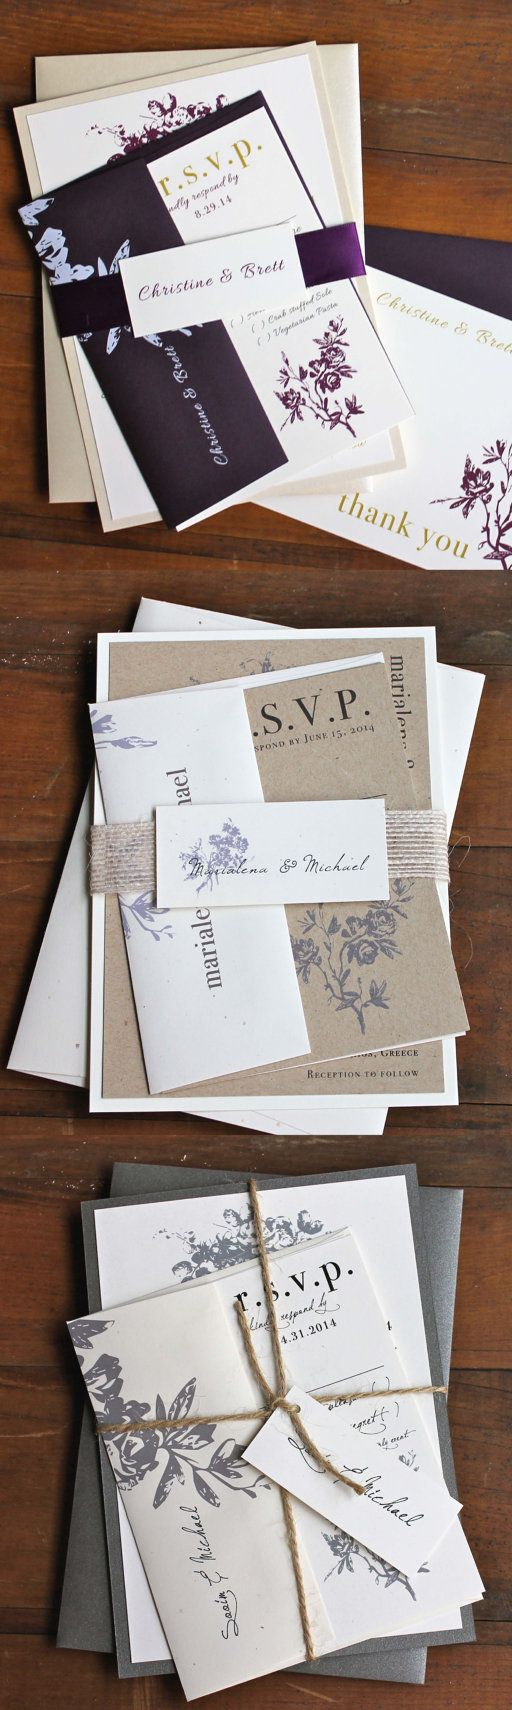 sample spanish wedding invitations%0A Wedding Invitations  Classic and Elegant Wedding Invitations  Gray Wedding   Elegant Ivory Wedding Invitations    All White   Sample